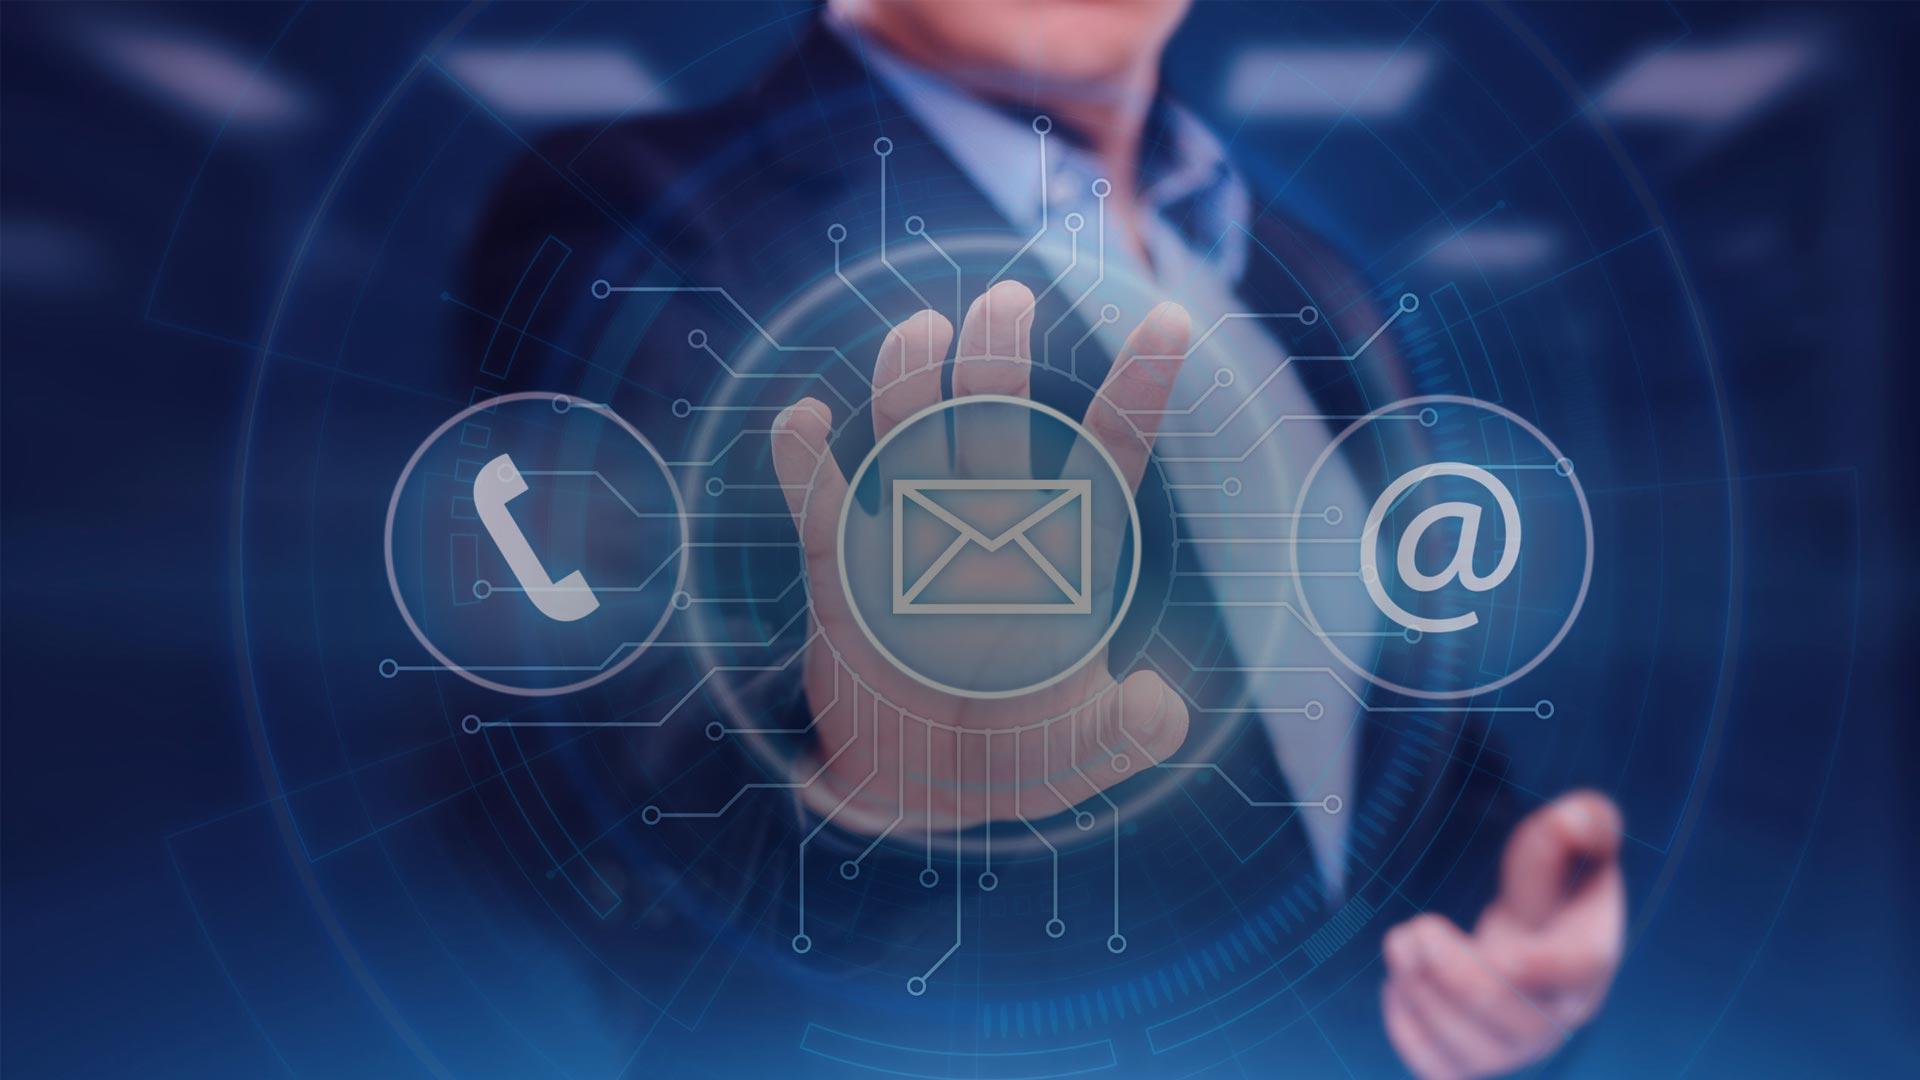 Customer service Internet businesstechnology concept